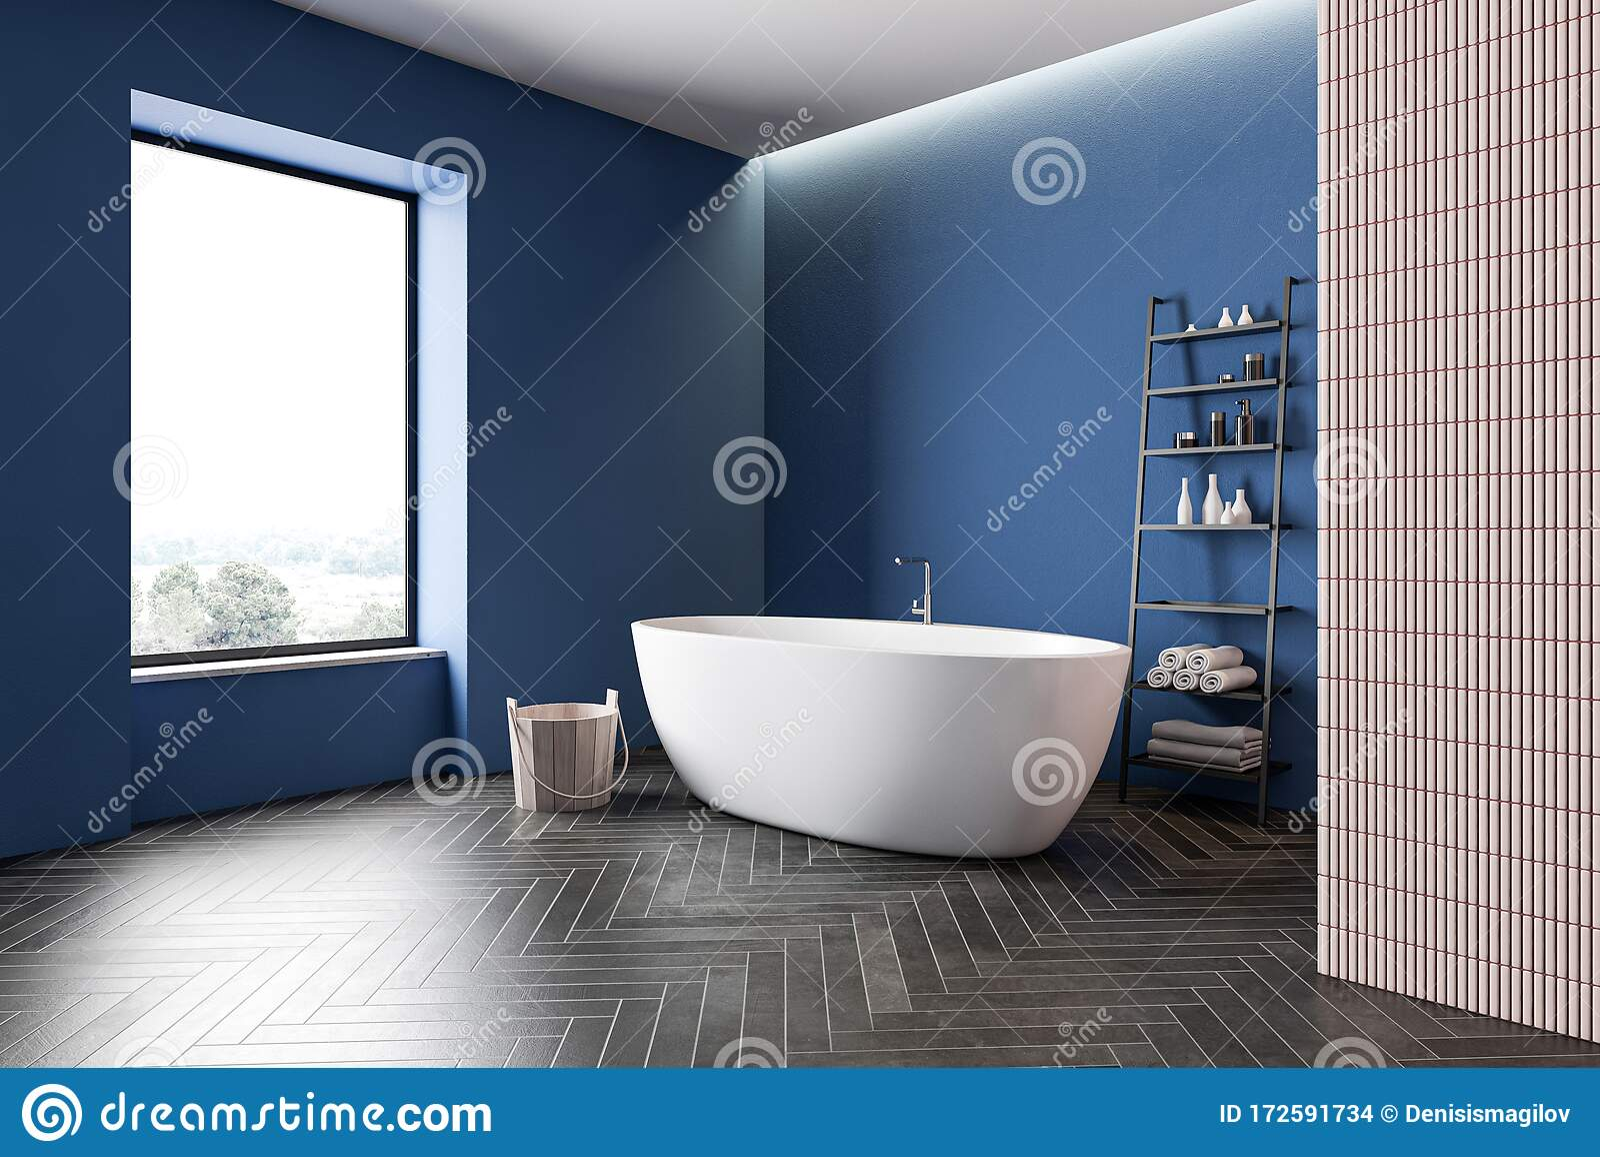 https www dreamstime com blue beige bathroom corner tub spa pink tile walls black wooden floor comfortable bathtub bucket shelves towels beauty image172591734